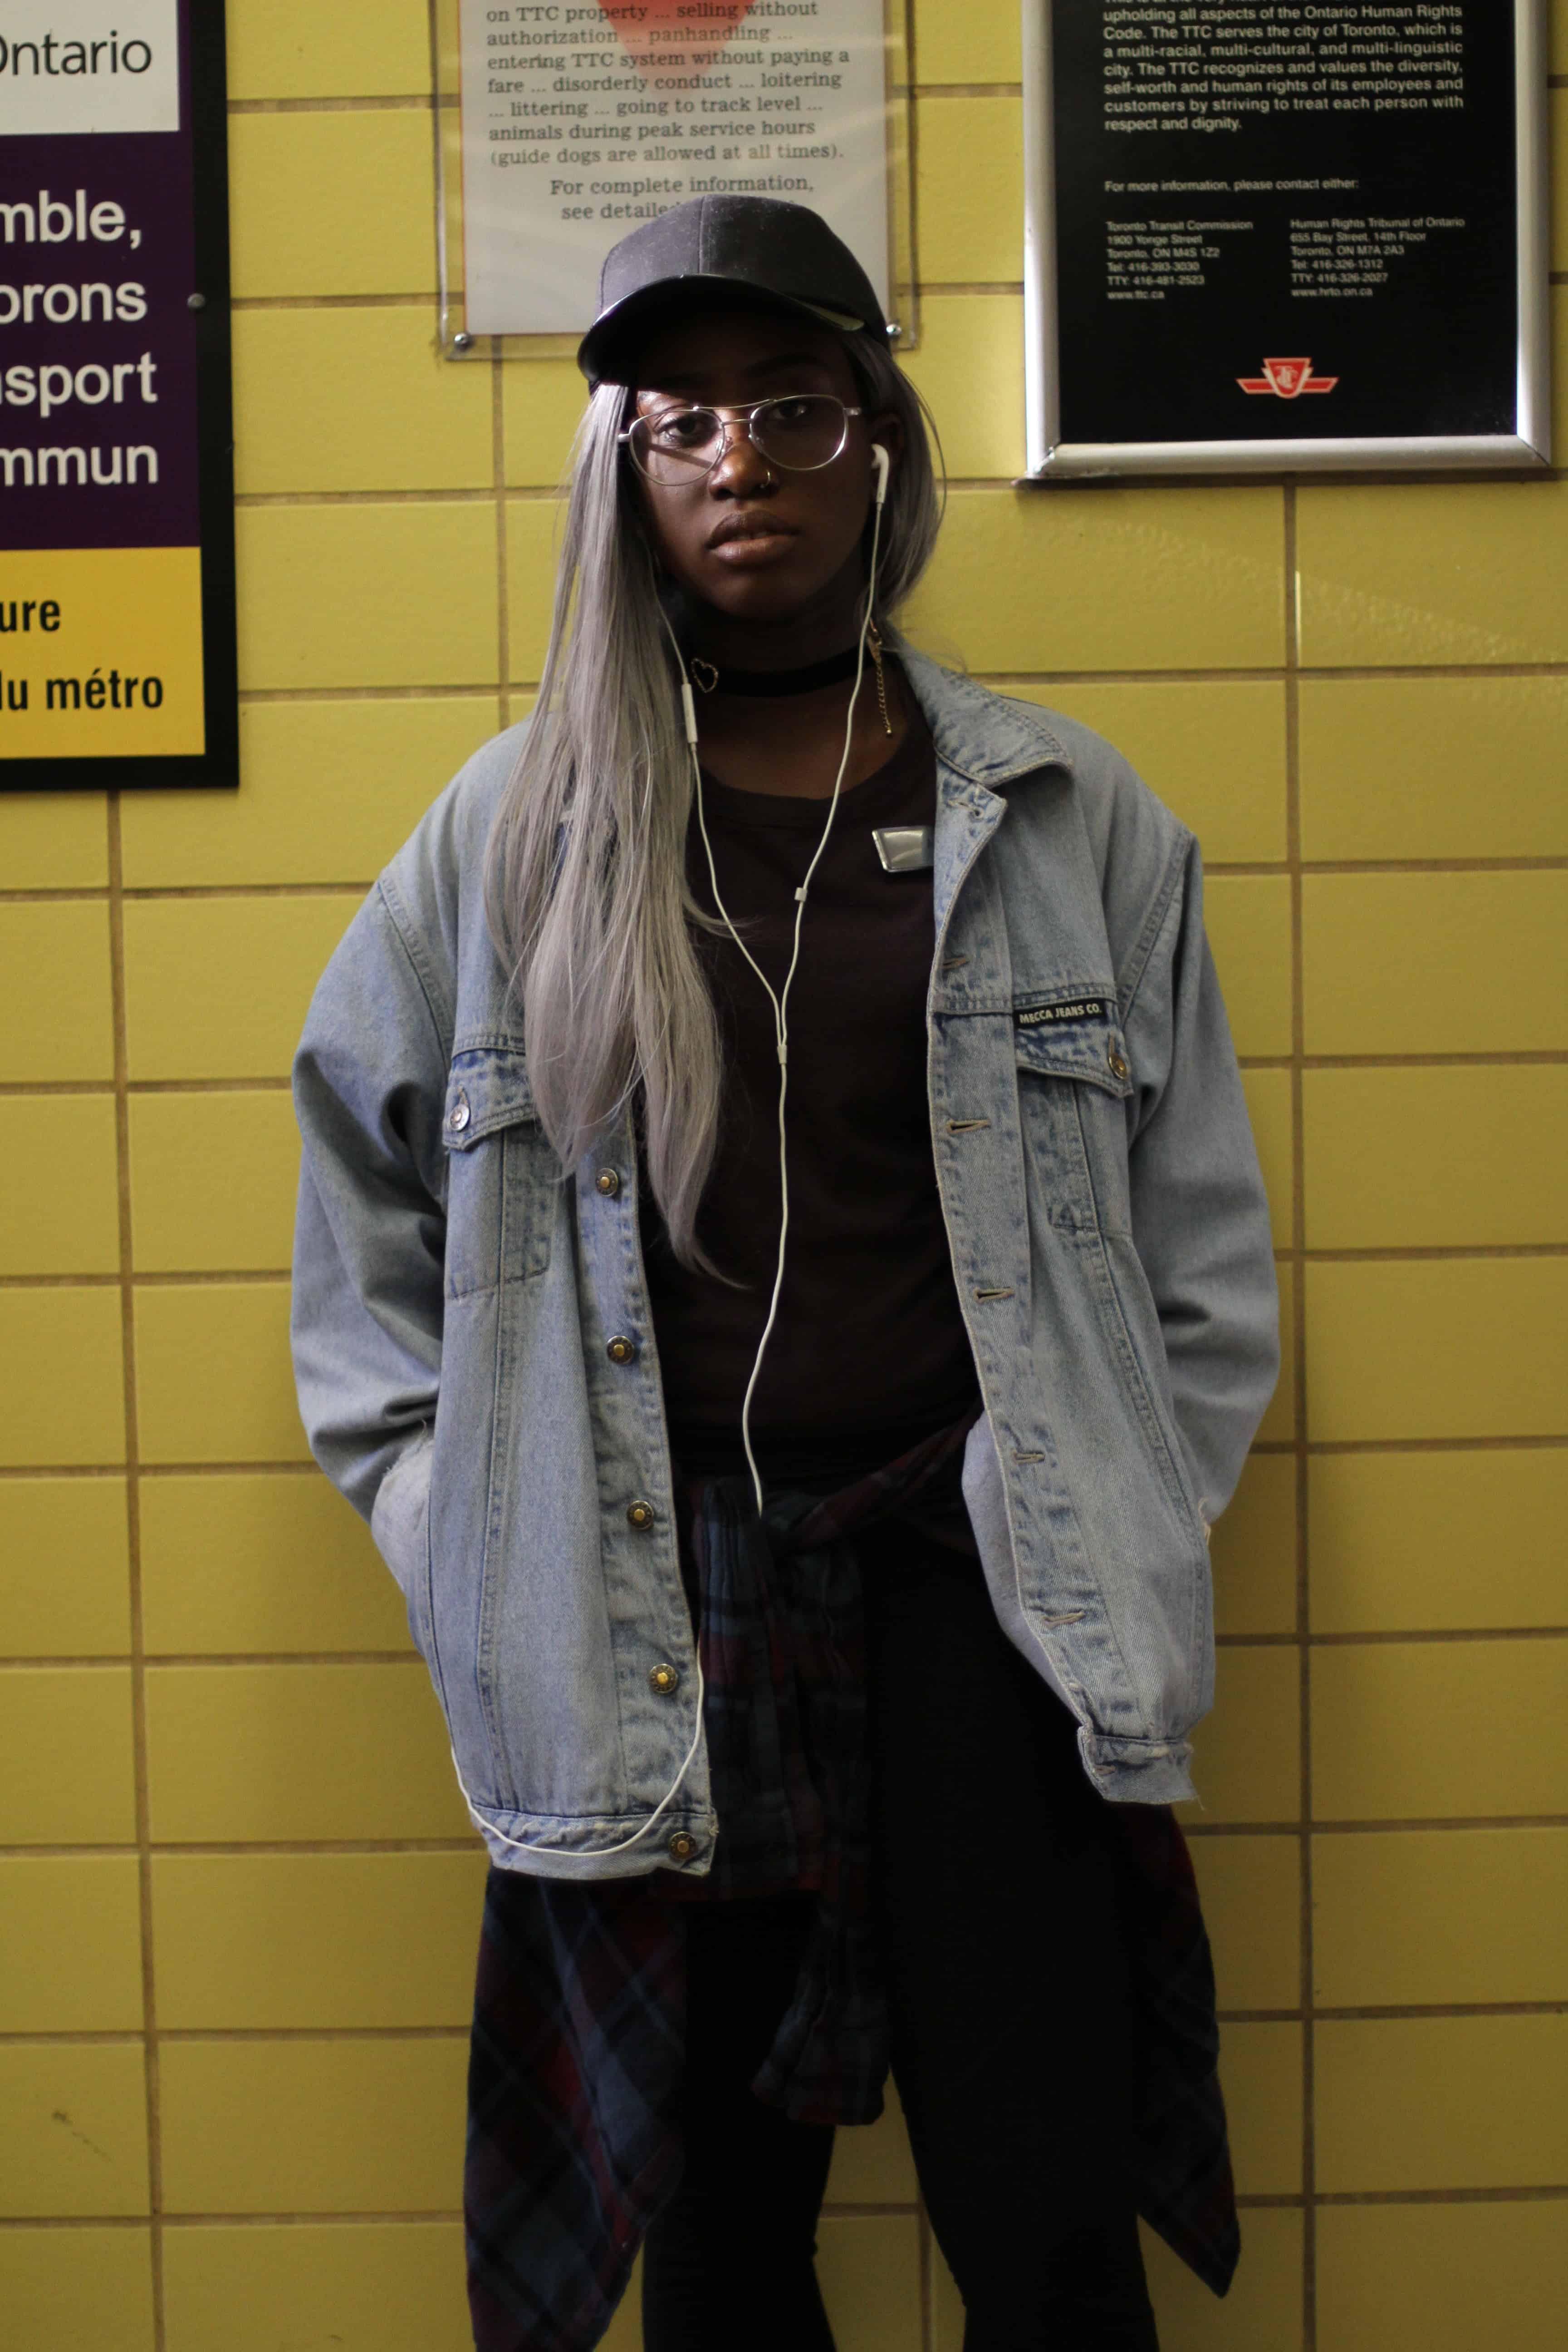 Street Style: Subway Stories - Dundas